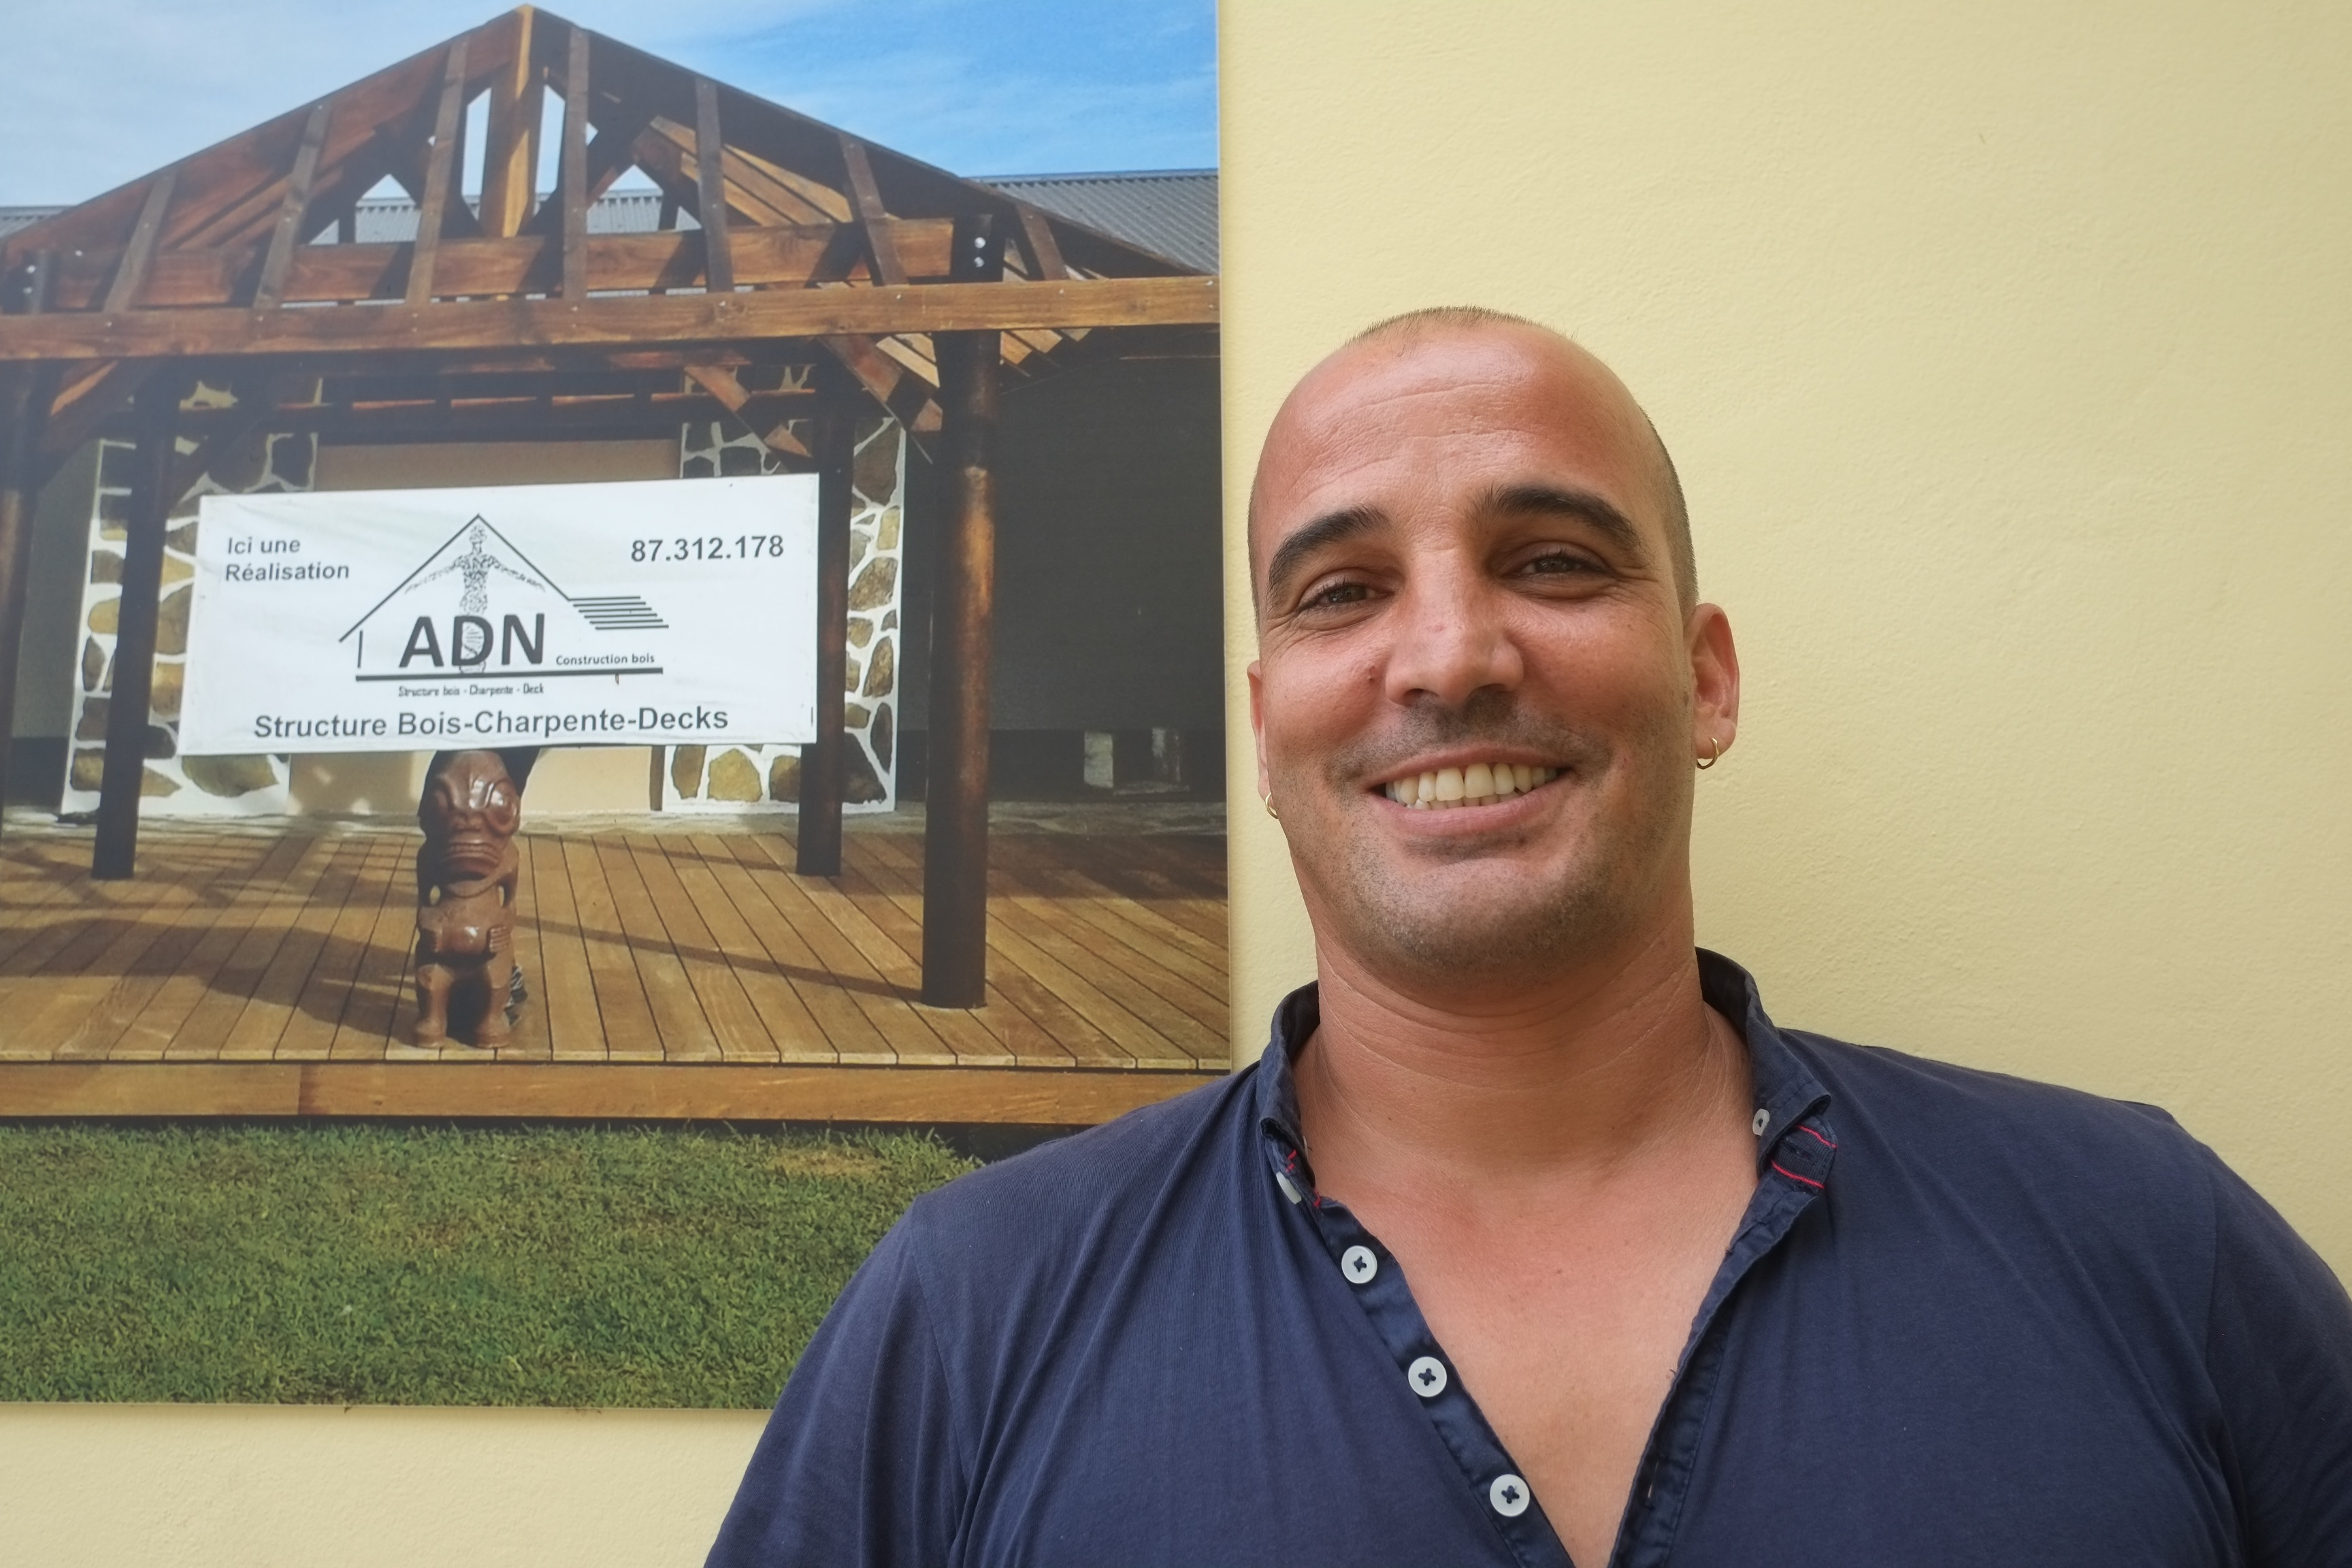 Guillaume Celestini, compagnon charpentier et entrepreneur